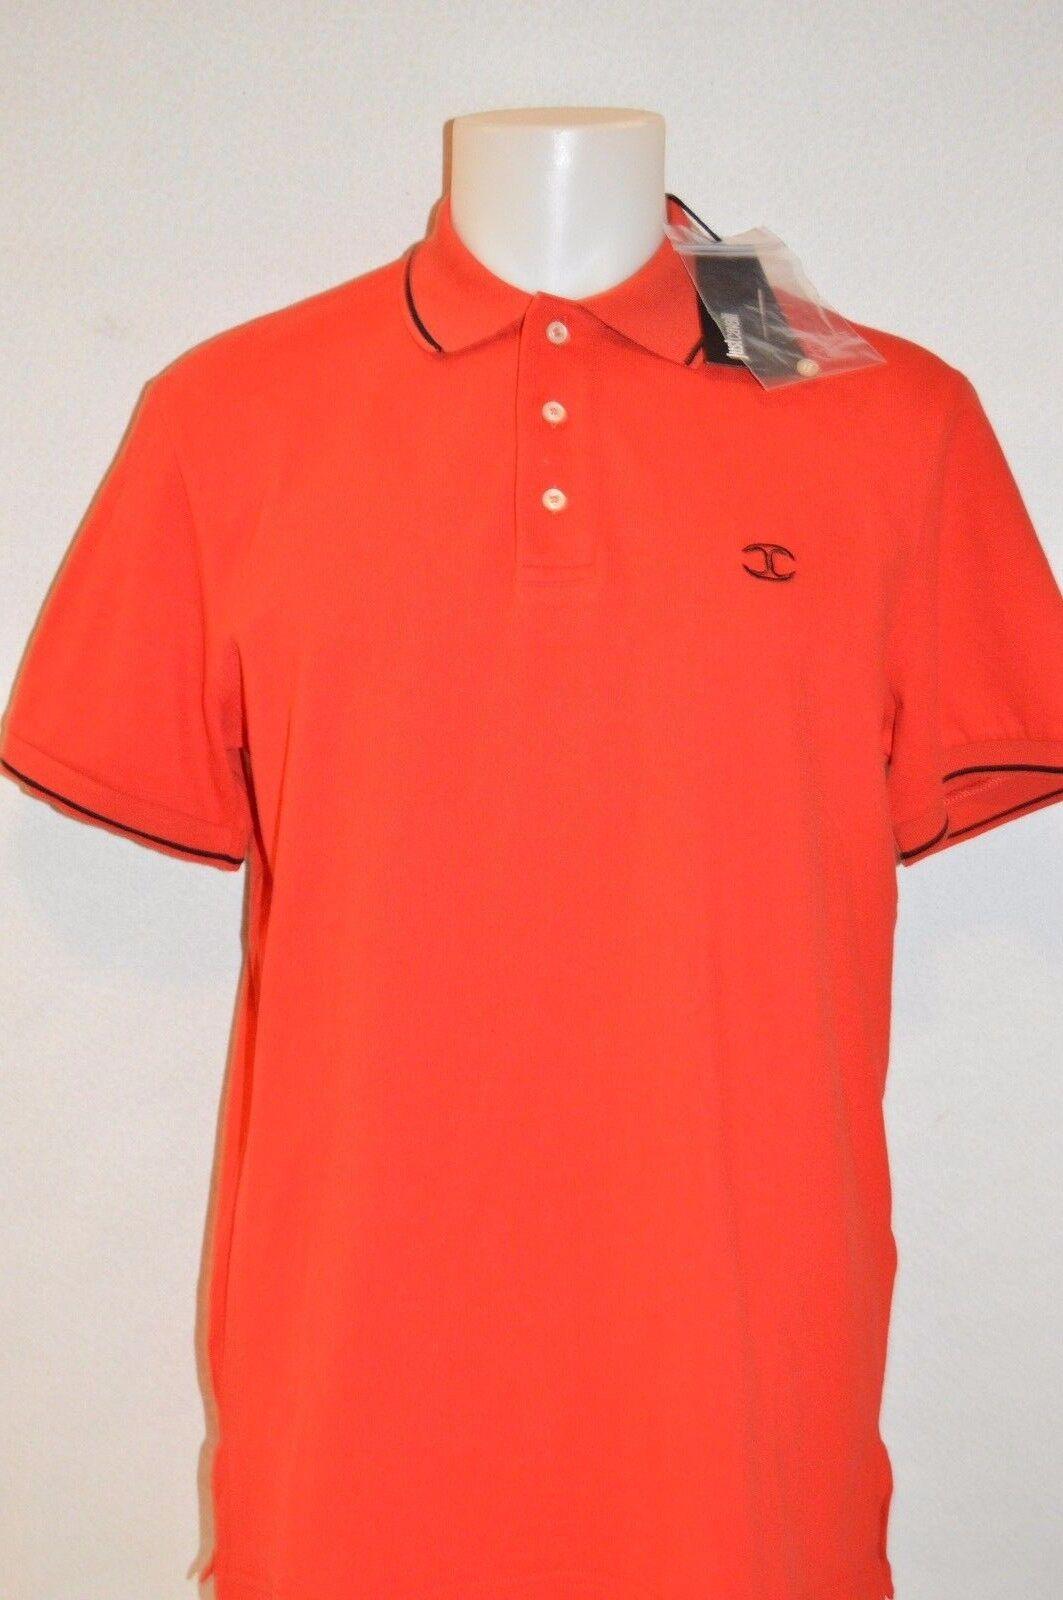 JUST CAVALLI Man's LOGO 3 Button Polo T-shirt NEW  Größe 52  X-Large  Retail 224